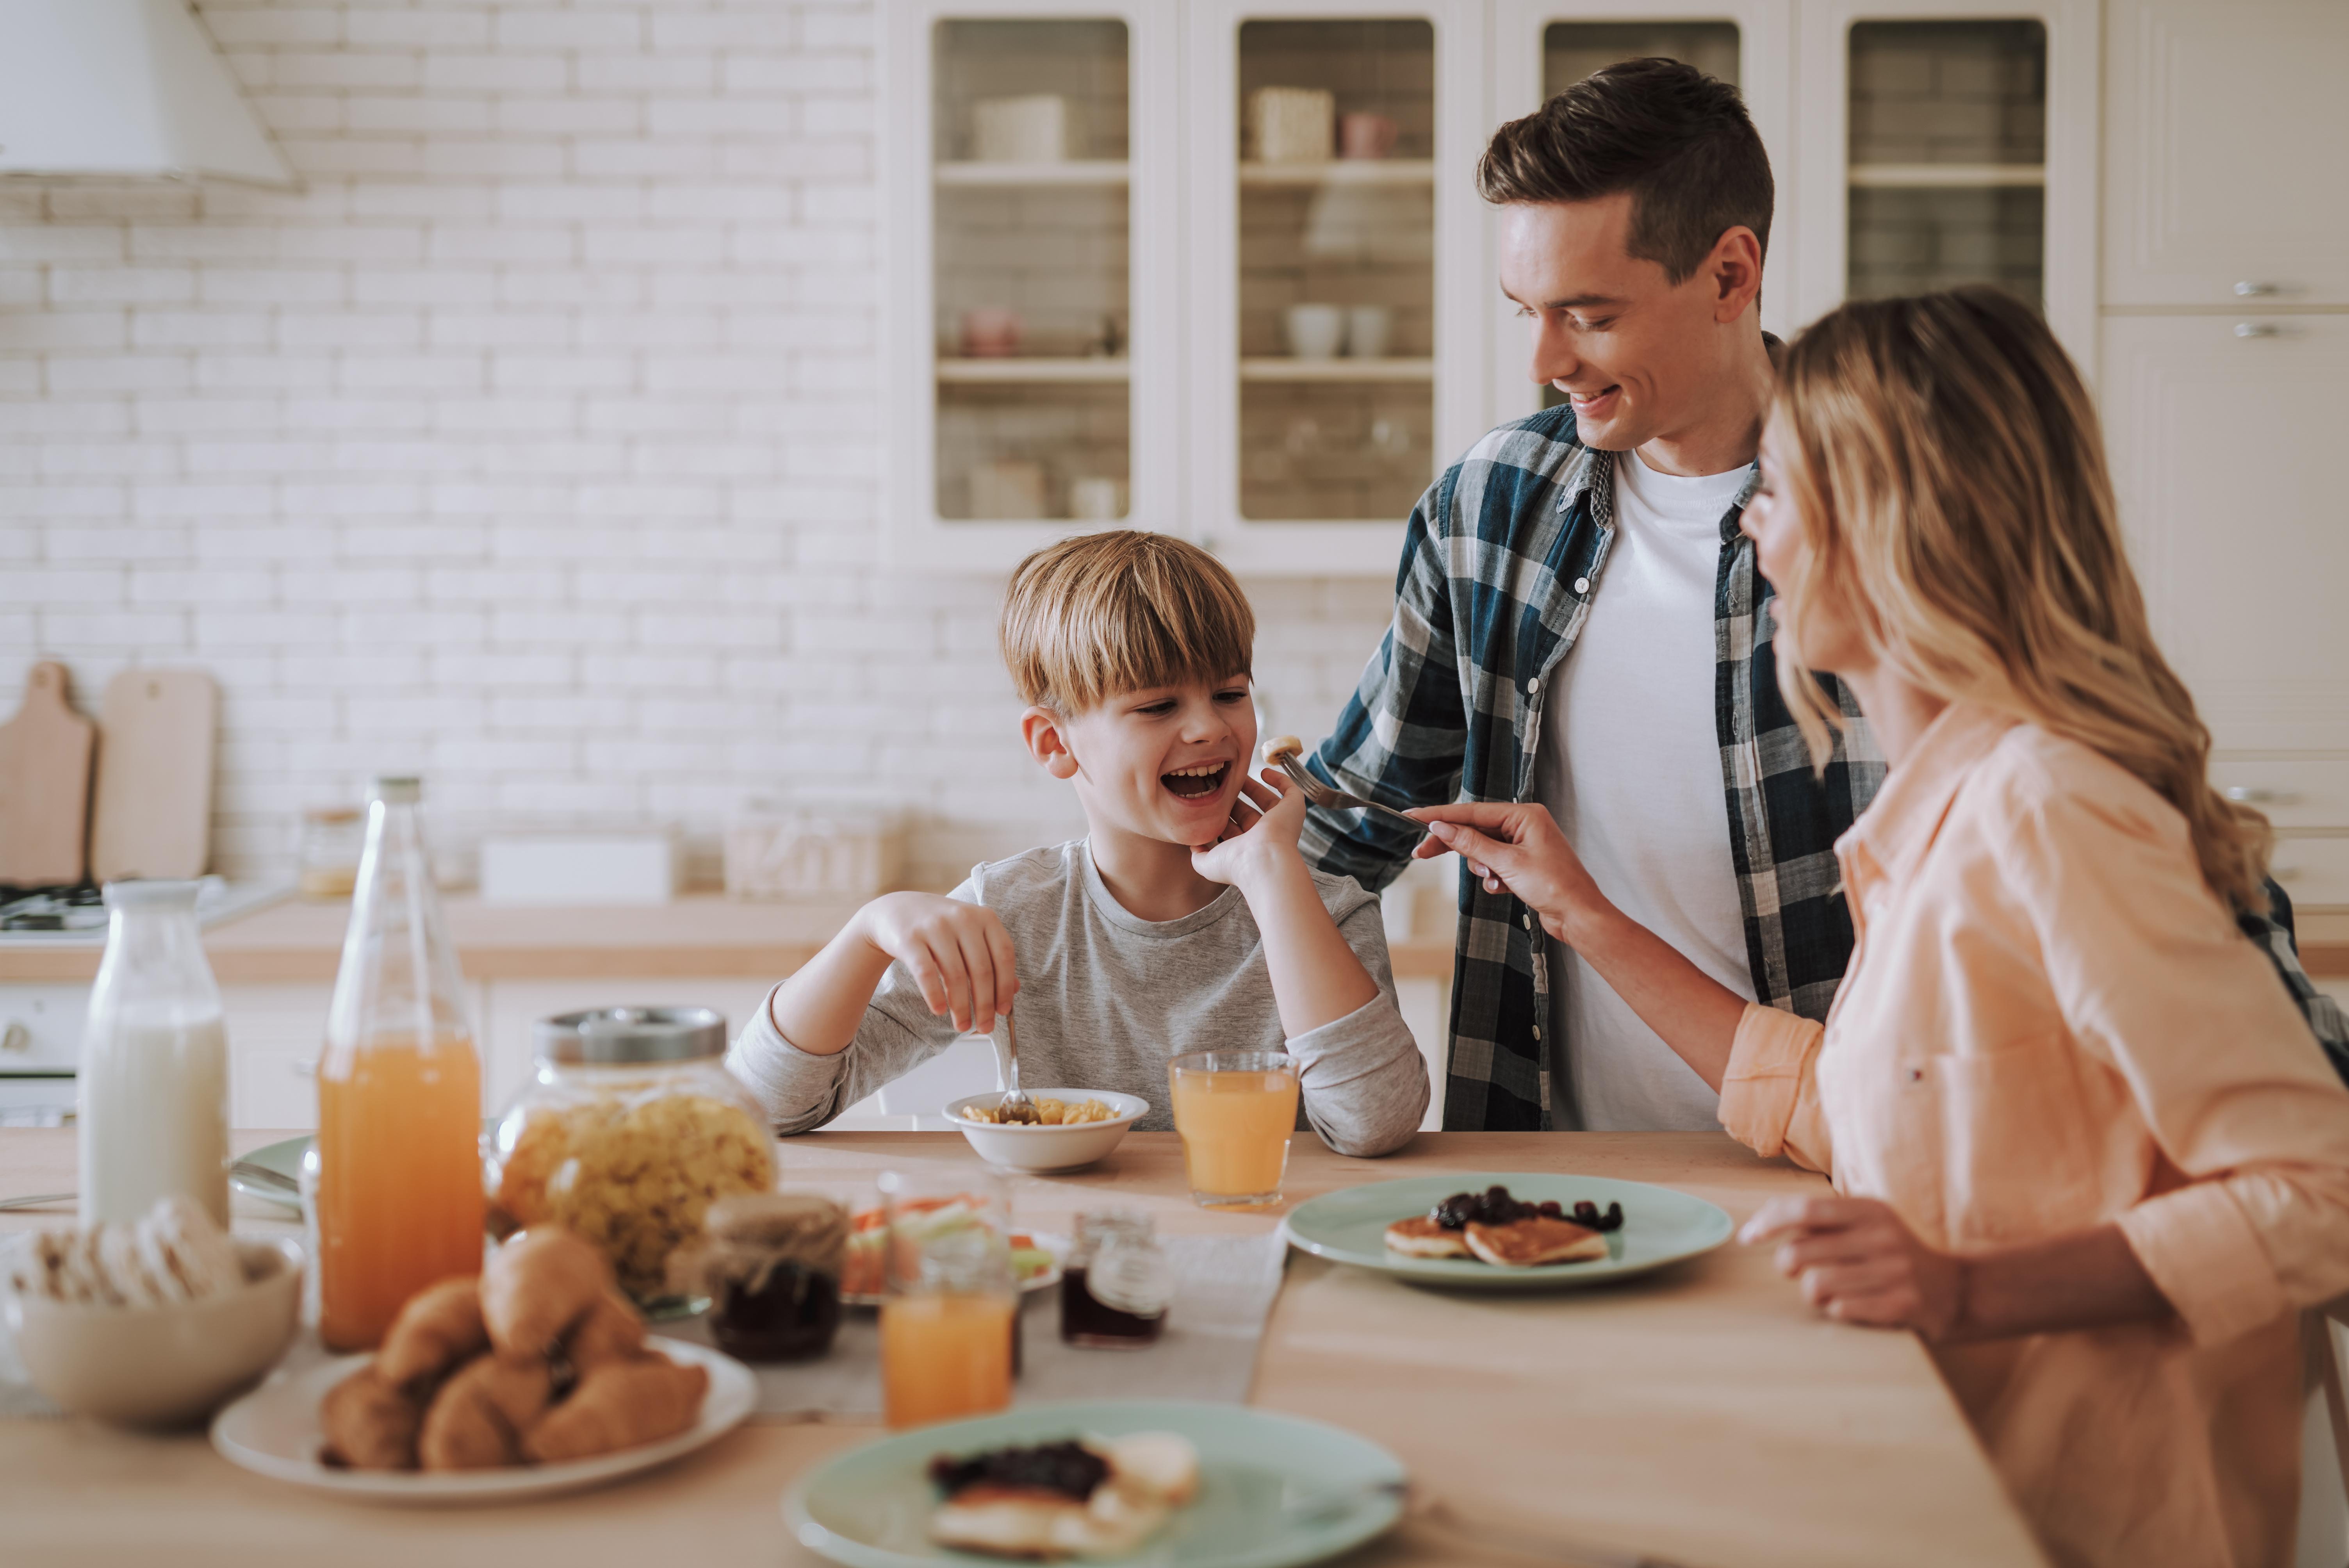 happy_kid_having breakfast with his parents